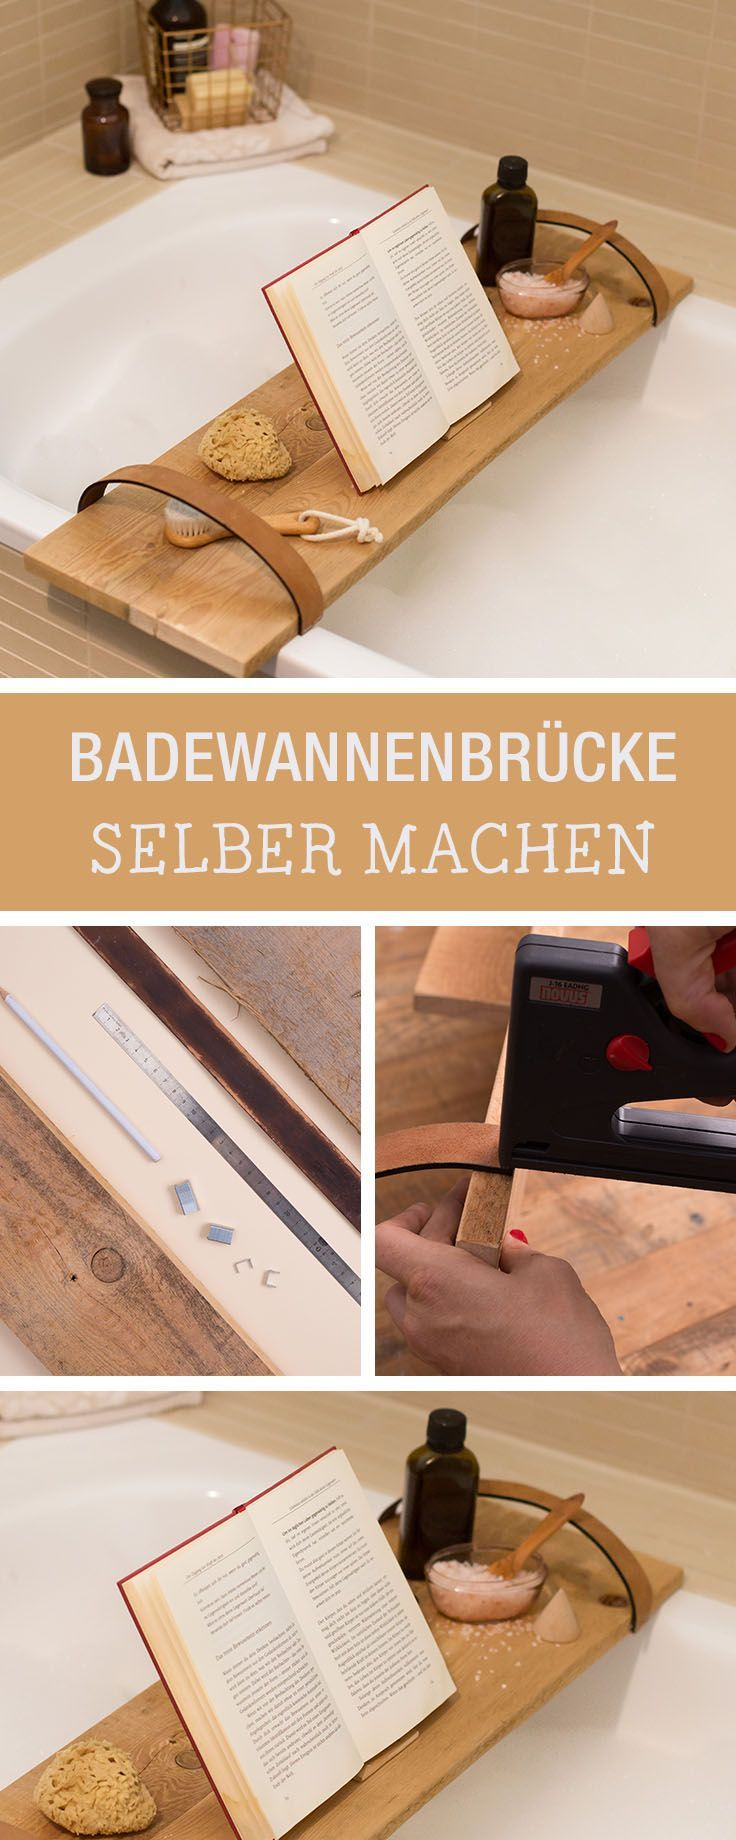 Möbel-DIY fürs Badezimmer: Brücke aus Holz für die Badewanne bauen / diy furniture for the bathroom, relaxing table for the bathtube via DaWanda.com